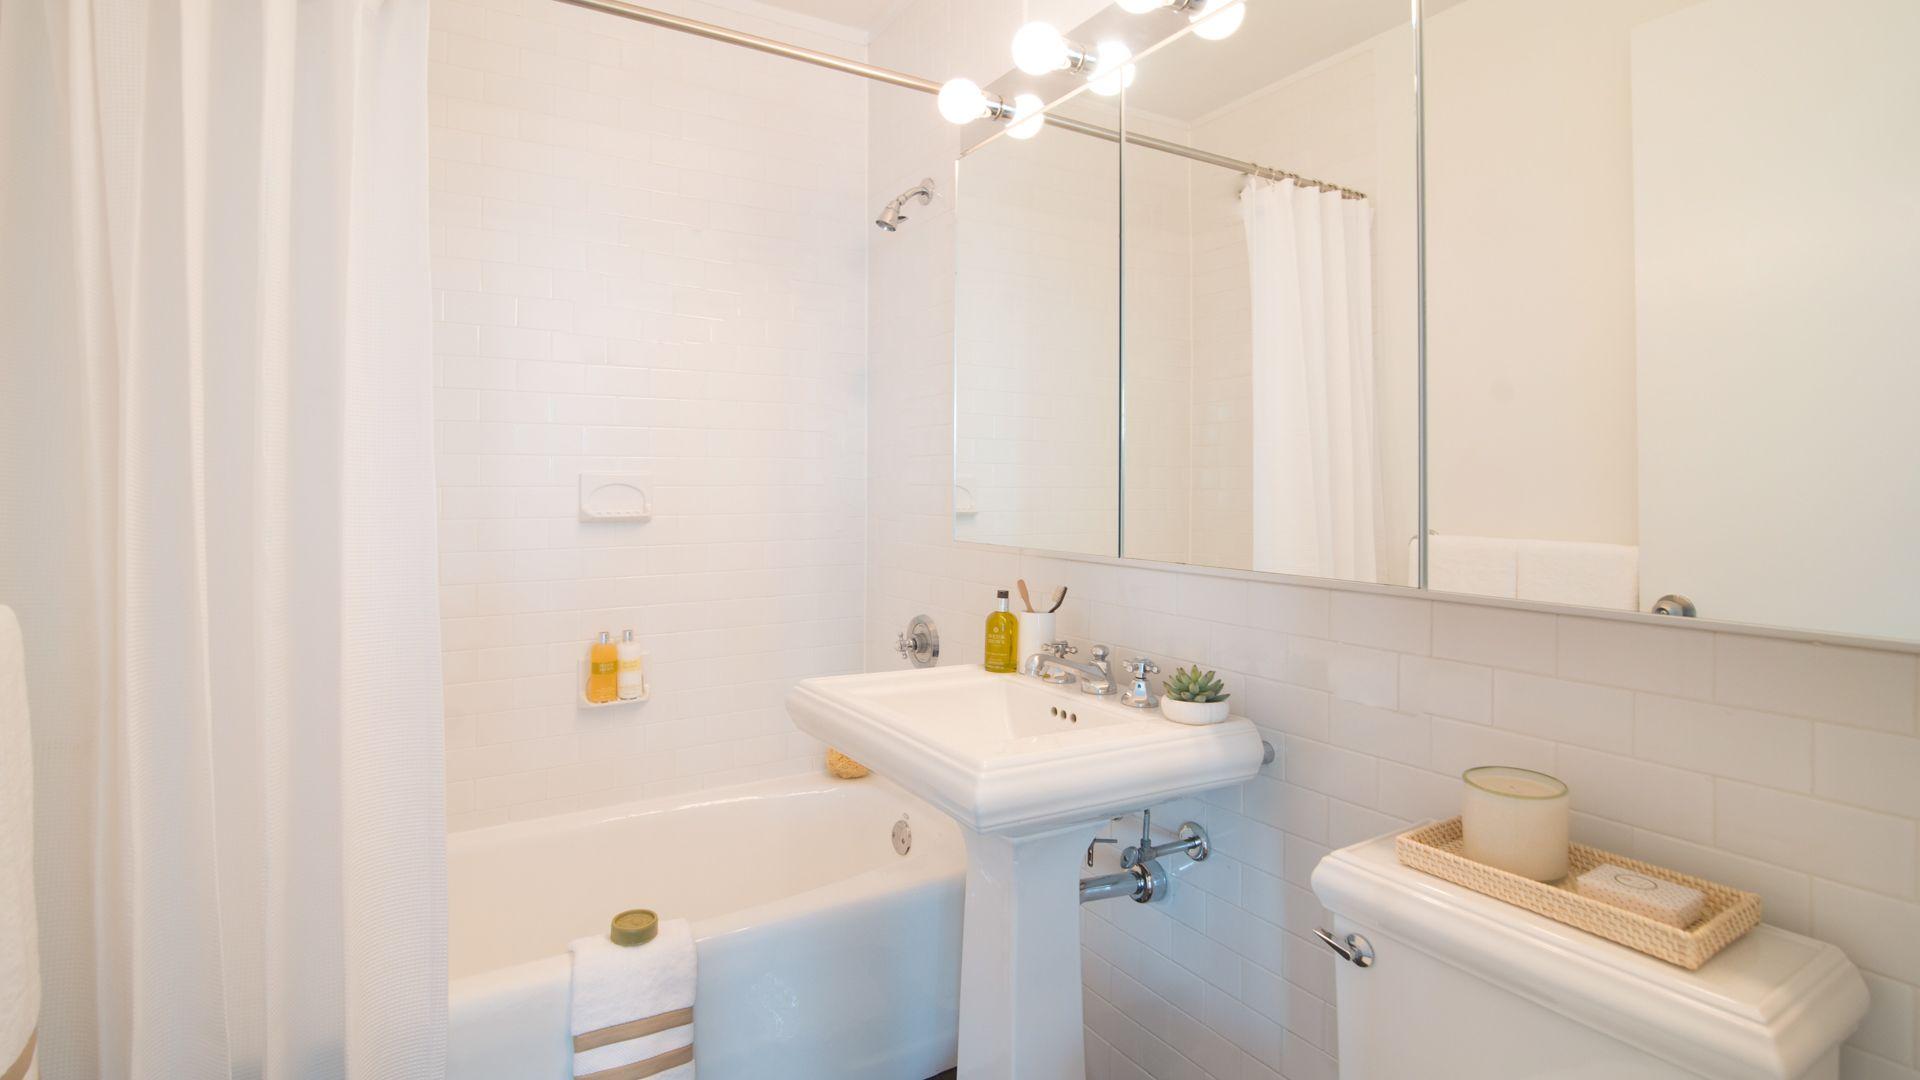 101 West End Apartments - Bathroom